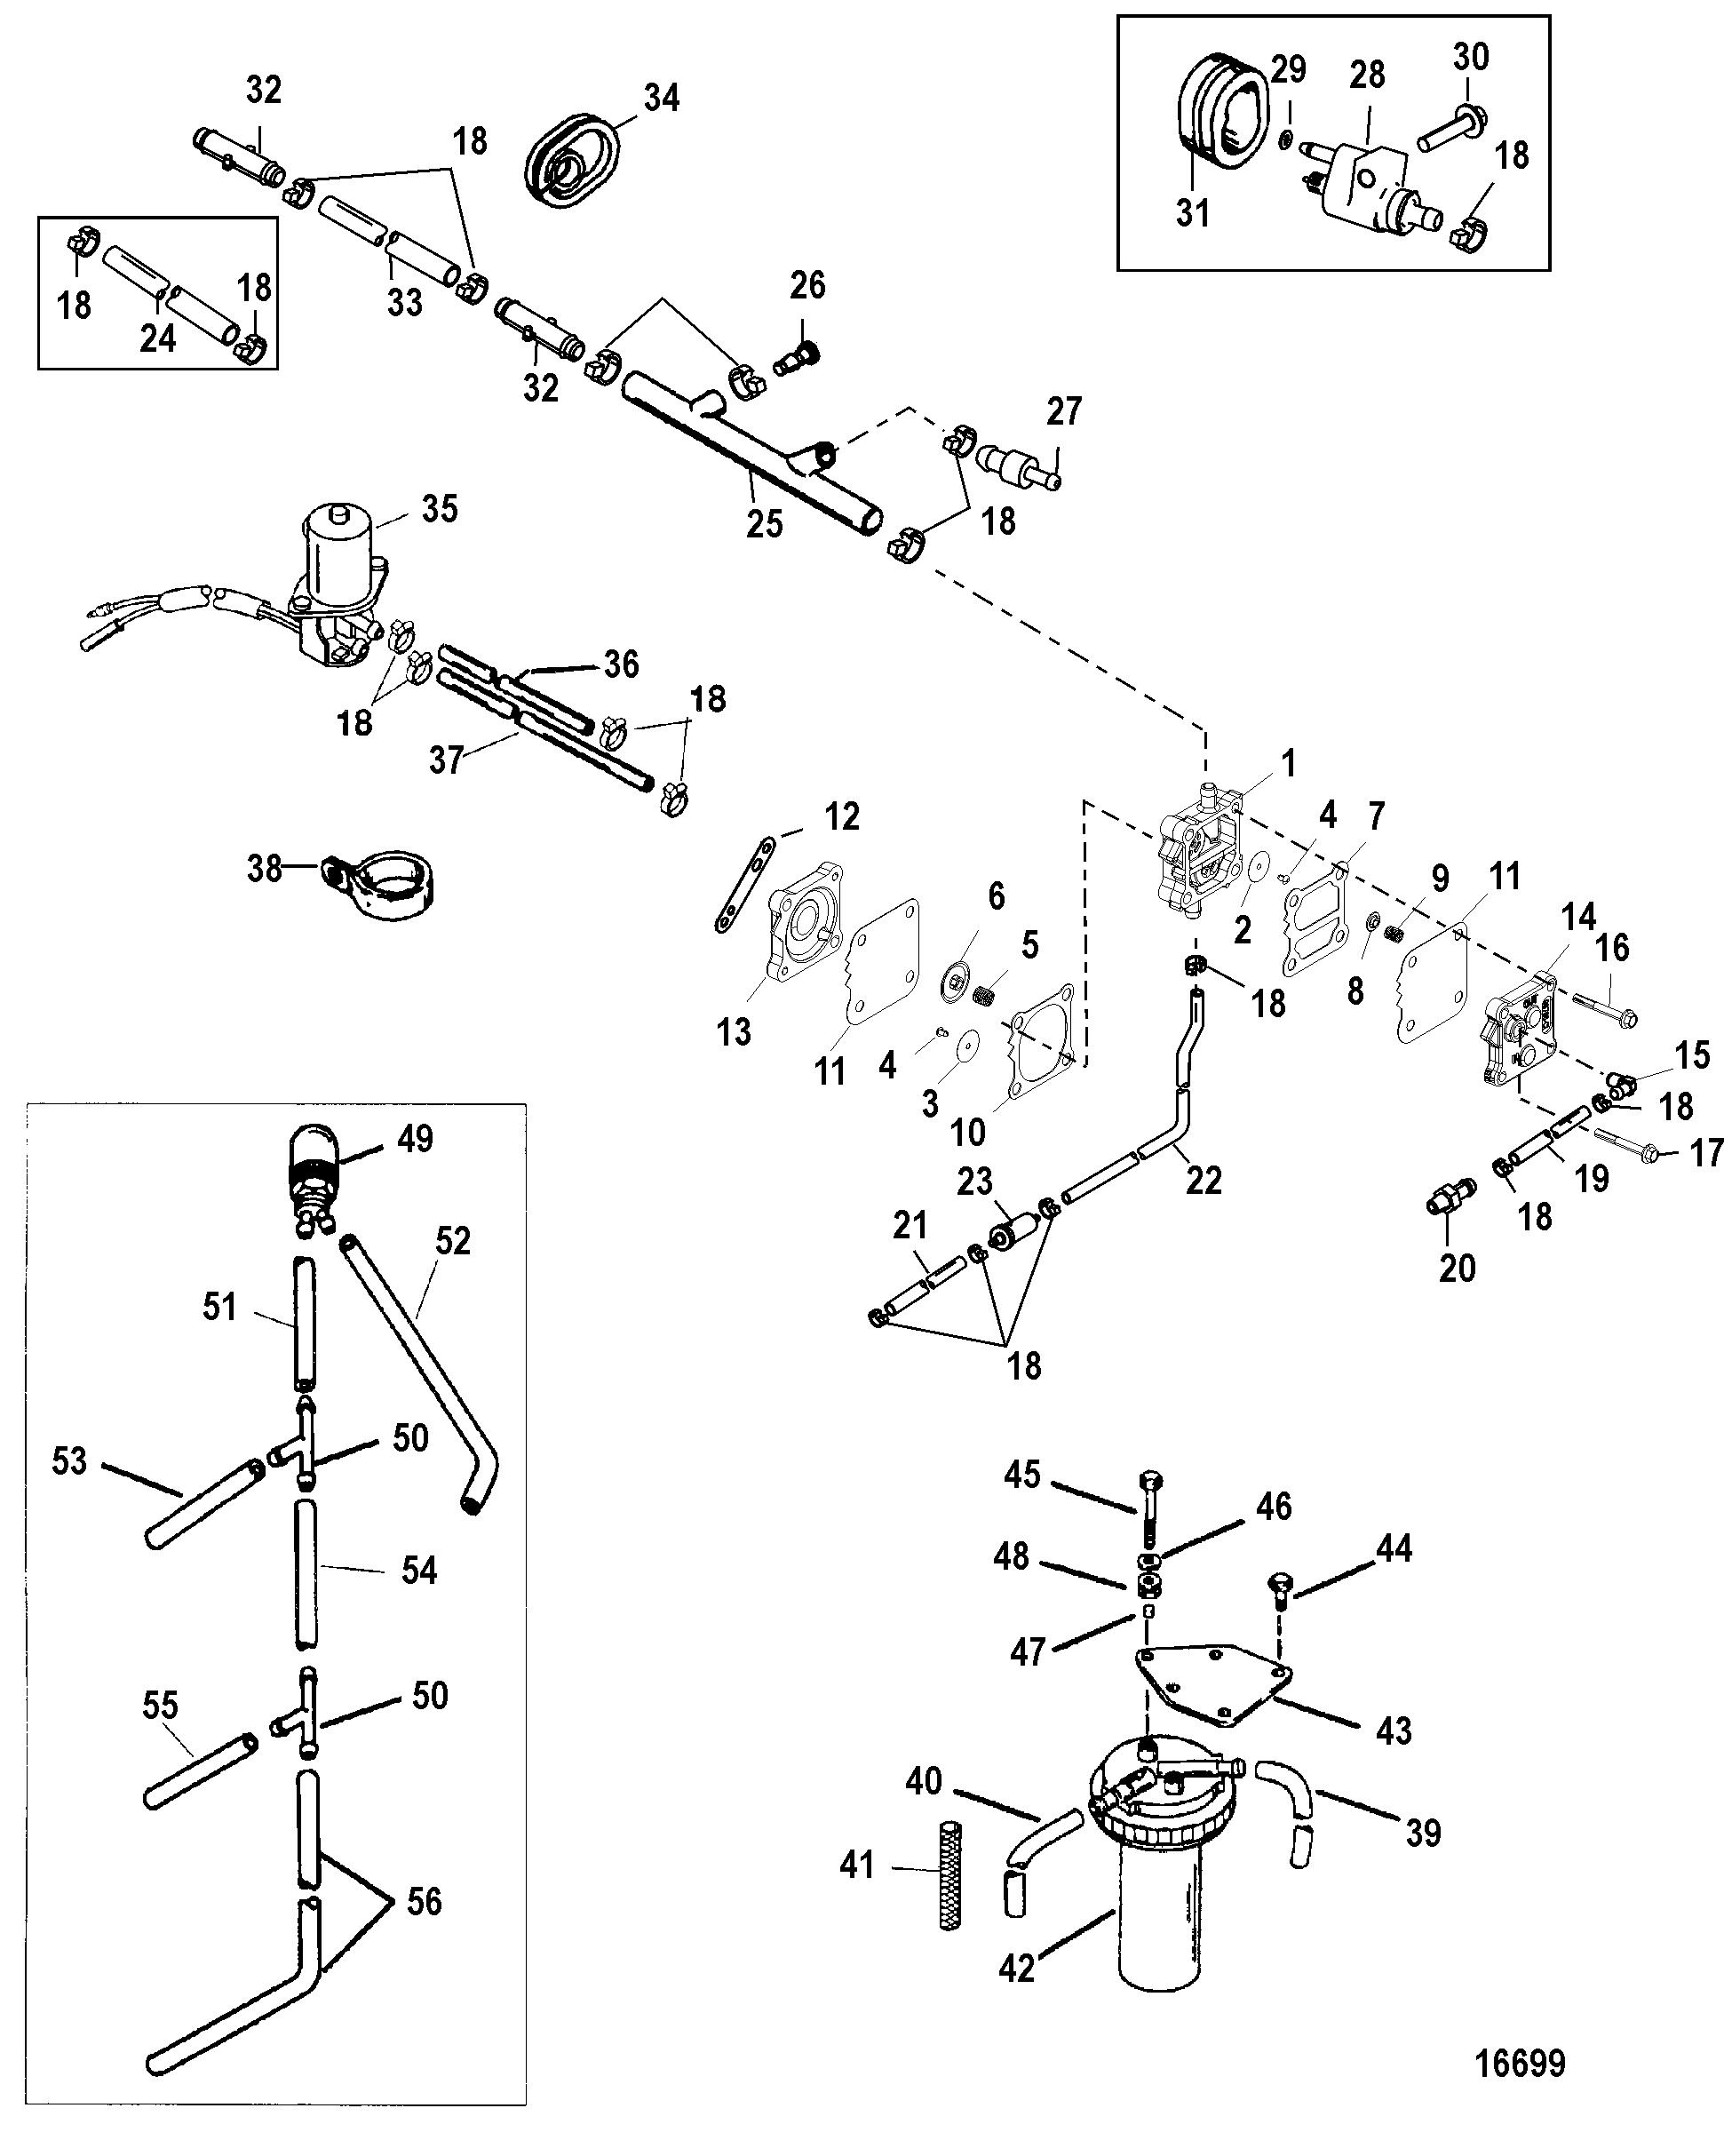 Fuel Pump FOR MARINER / MERCURY 75/90 HP 65 JET 3 CYLINDER